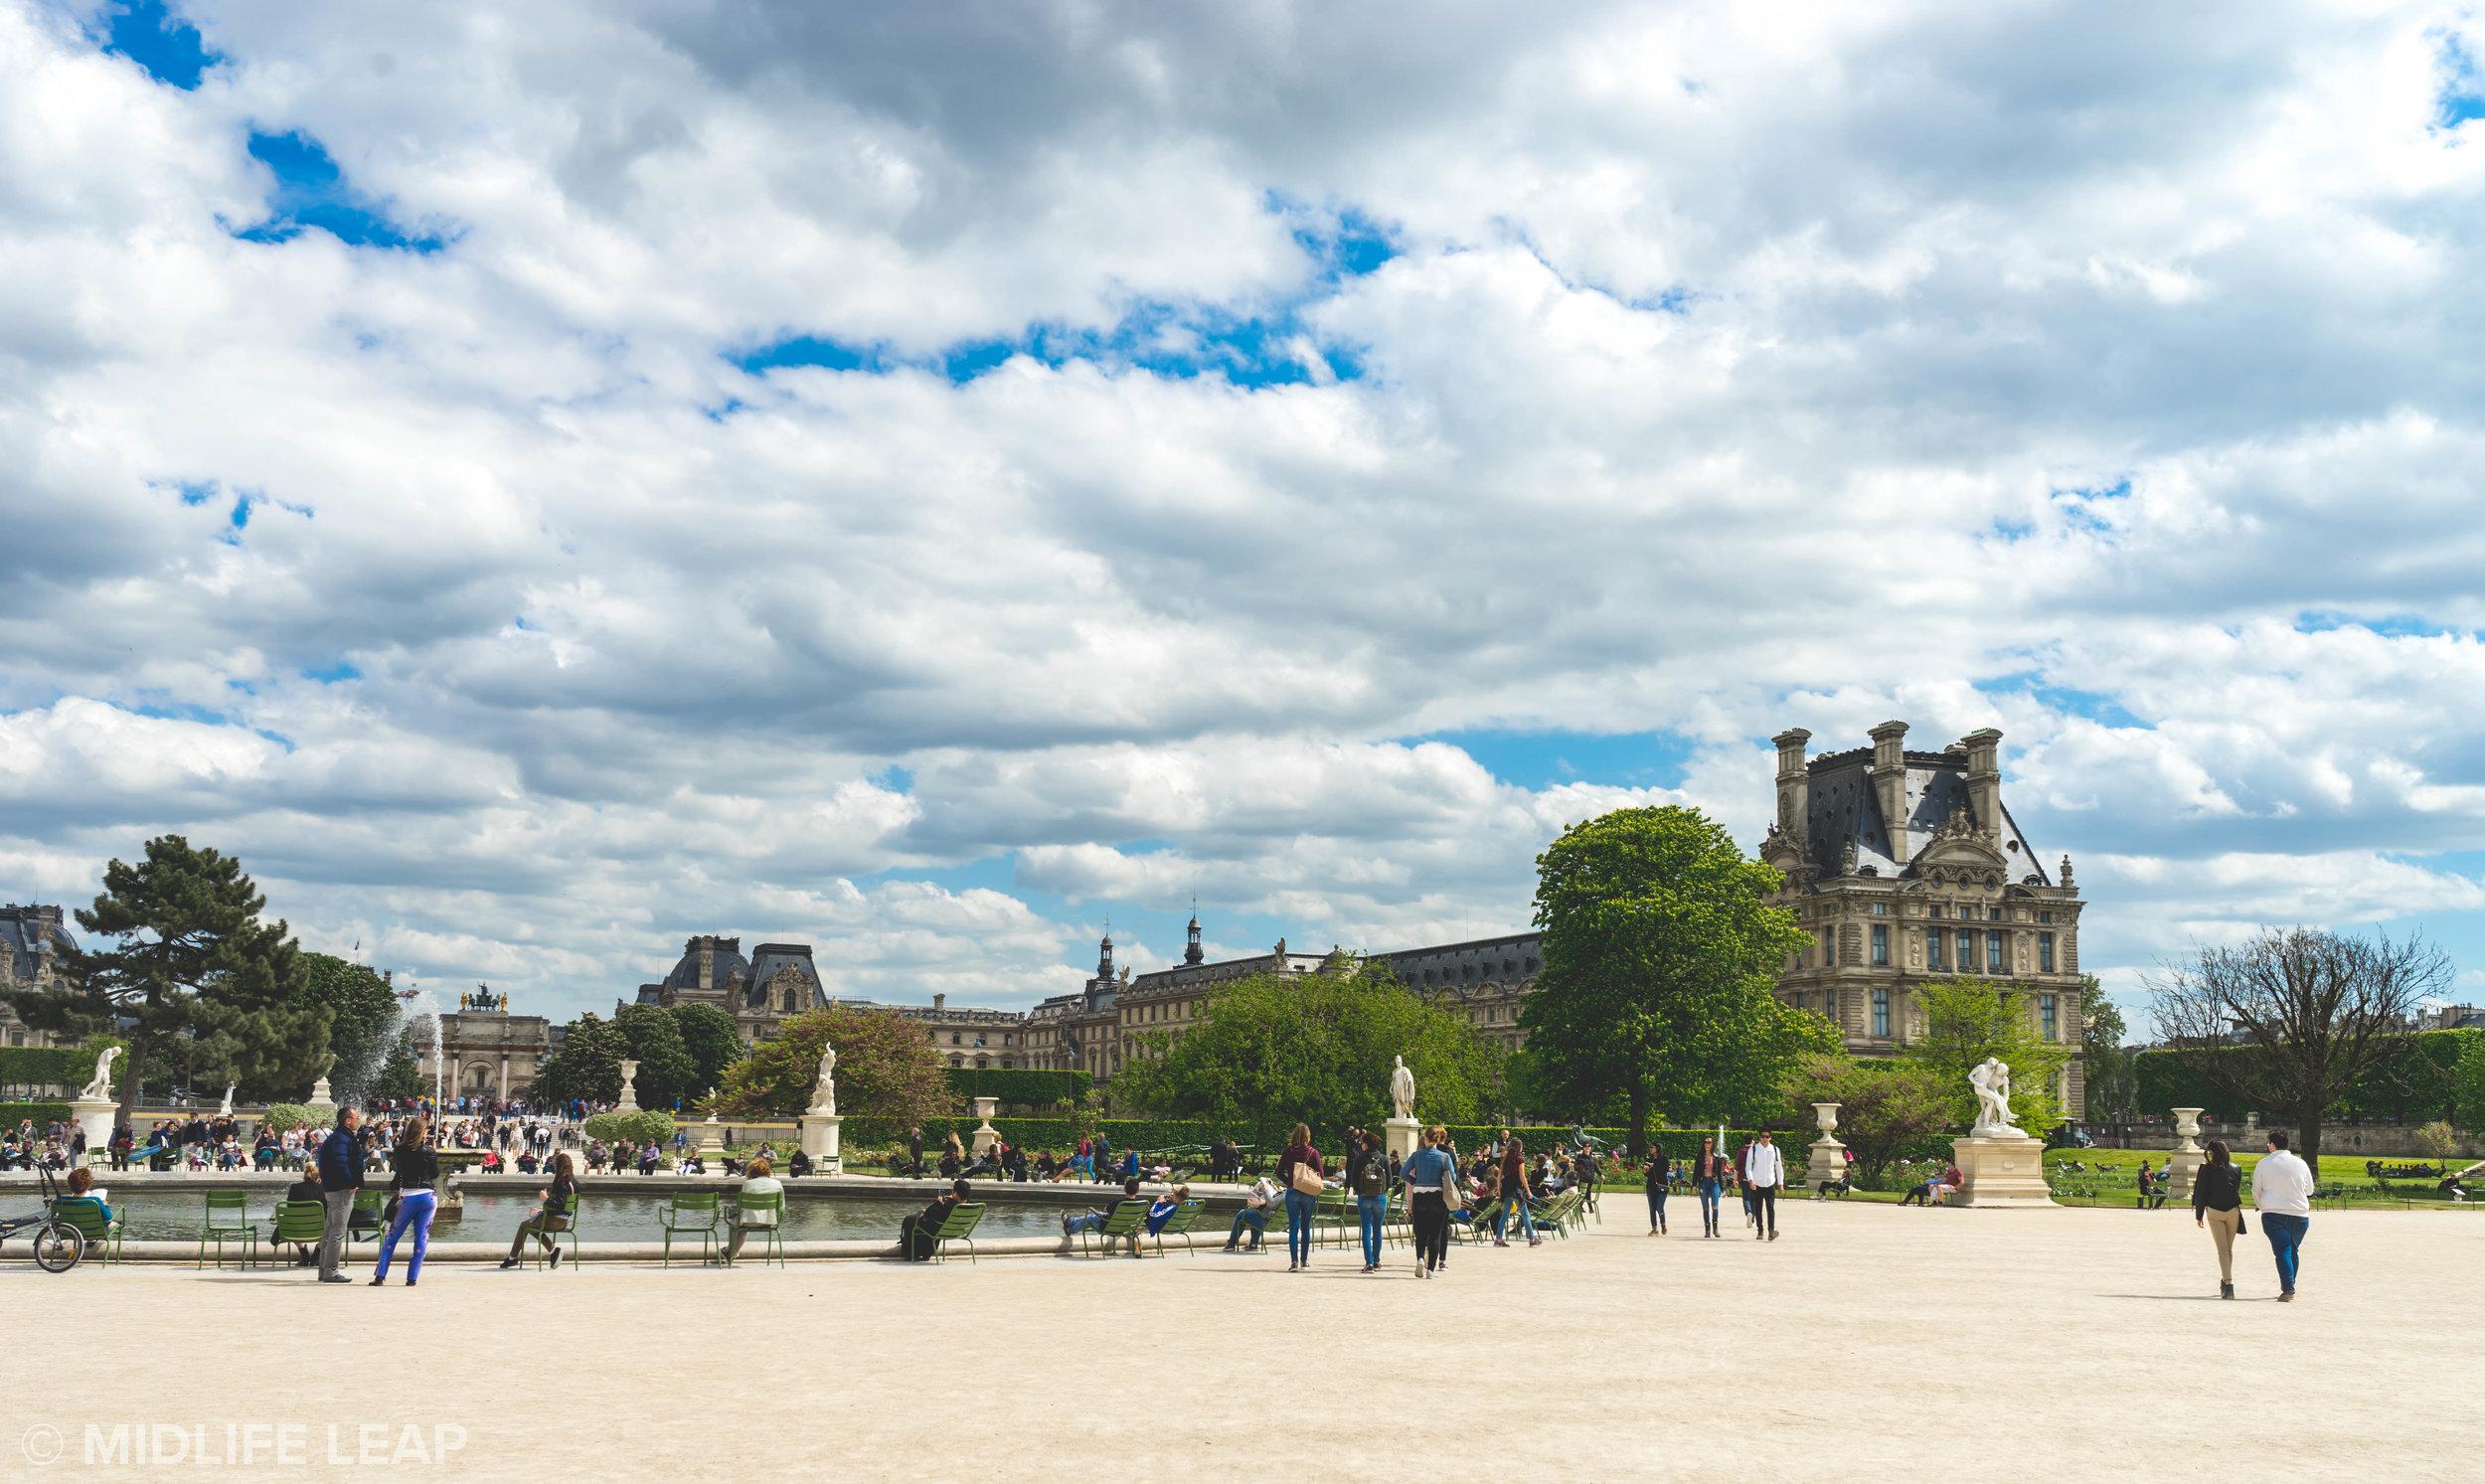 visiting-the-tuileries-gardens-in-paris